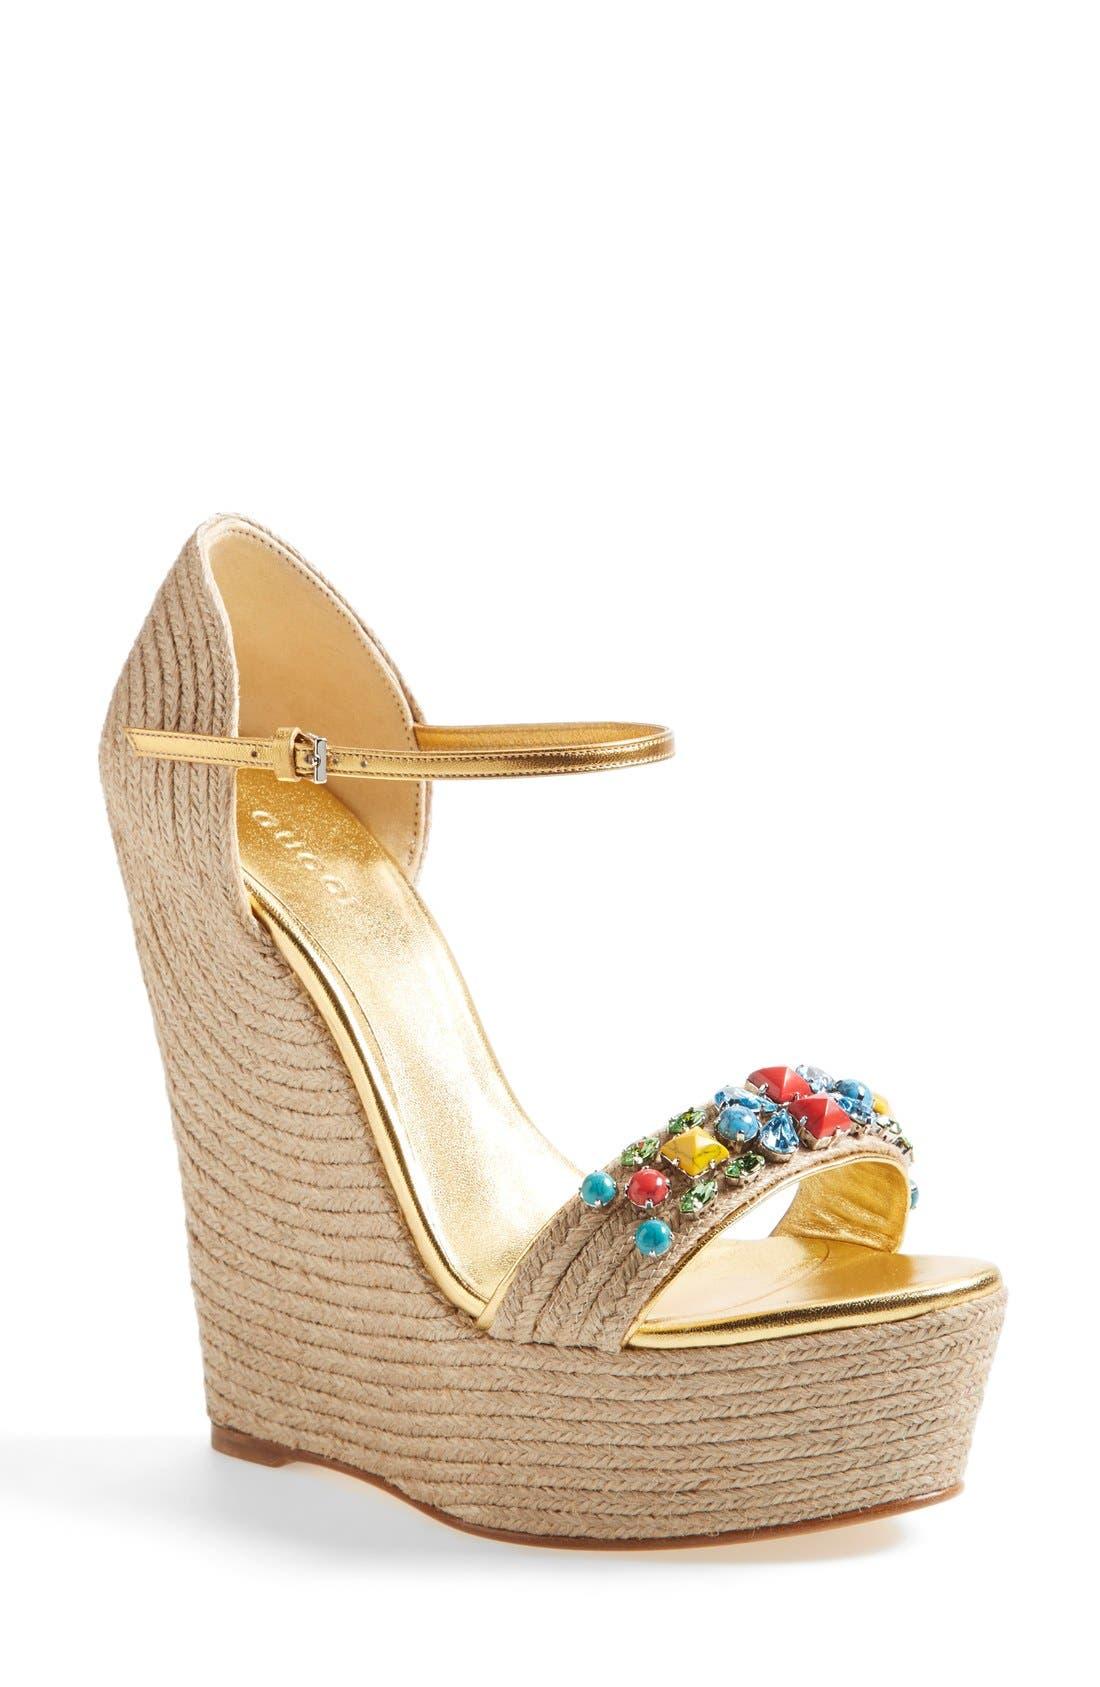 Main Image - Gucci 'Carolina' Jeweled Wedge Sandal (Women)